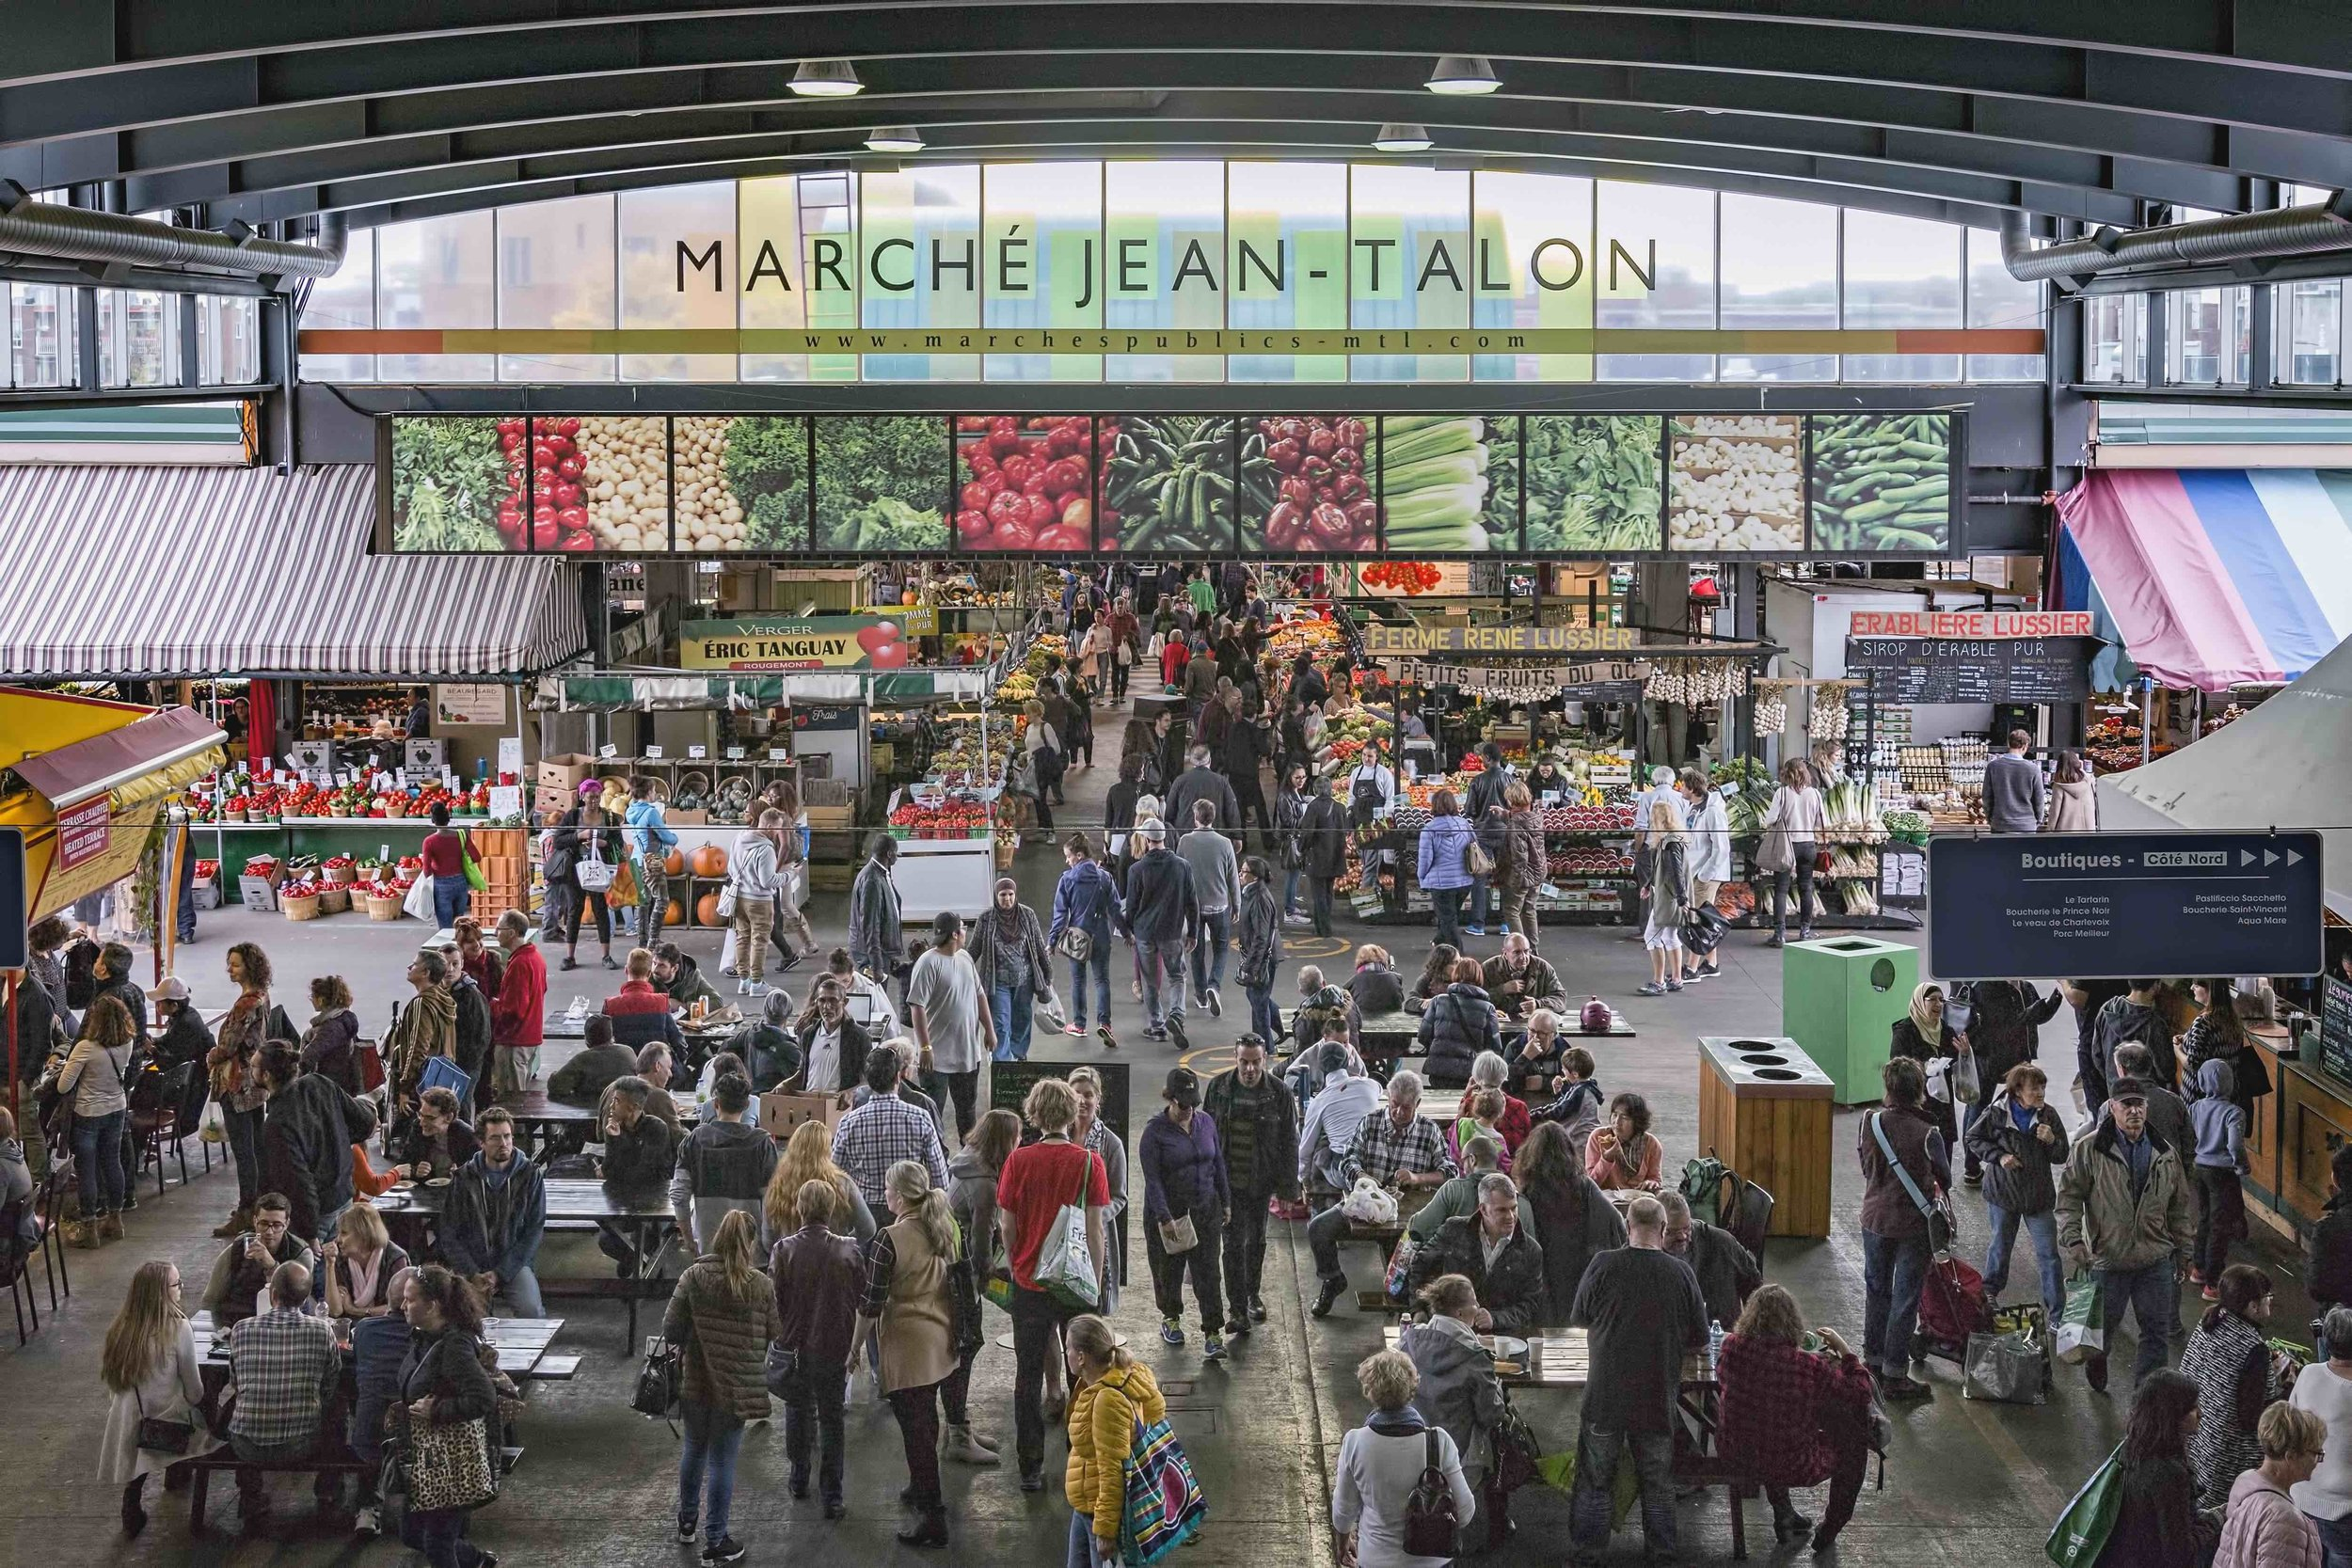 8) Marché Jean-Talon (Jean-Talon Market)